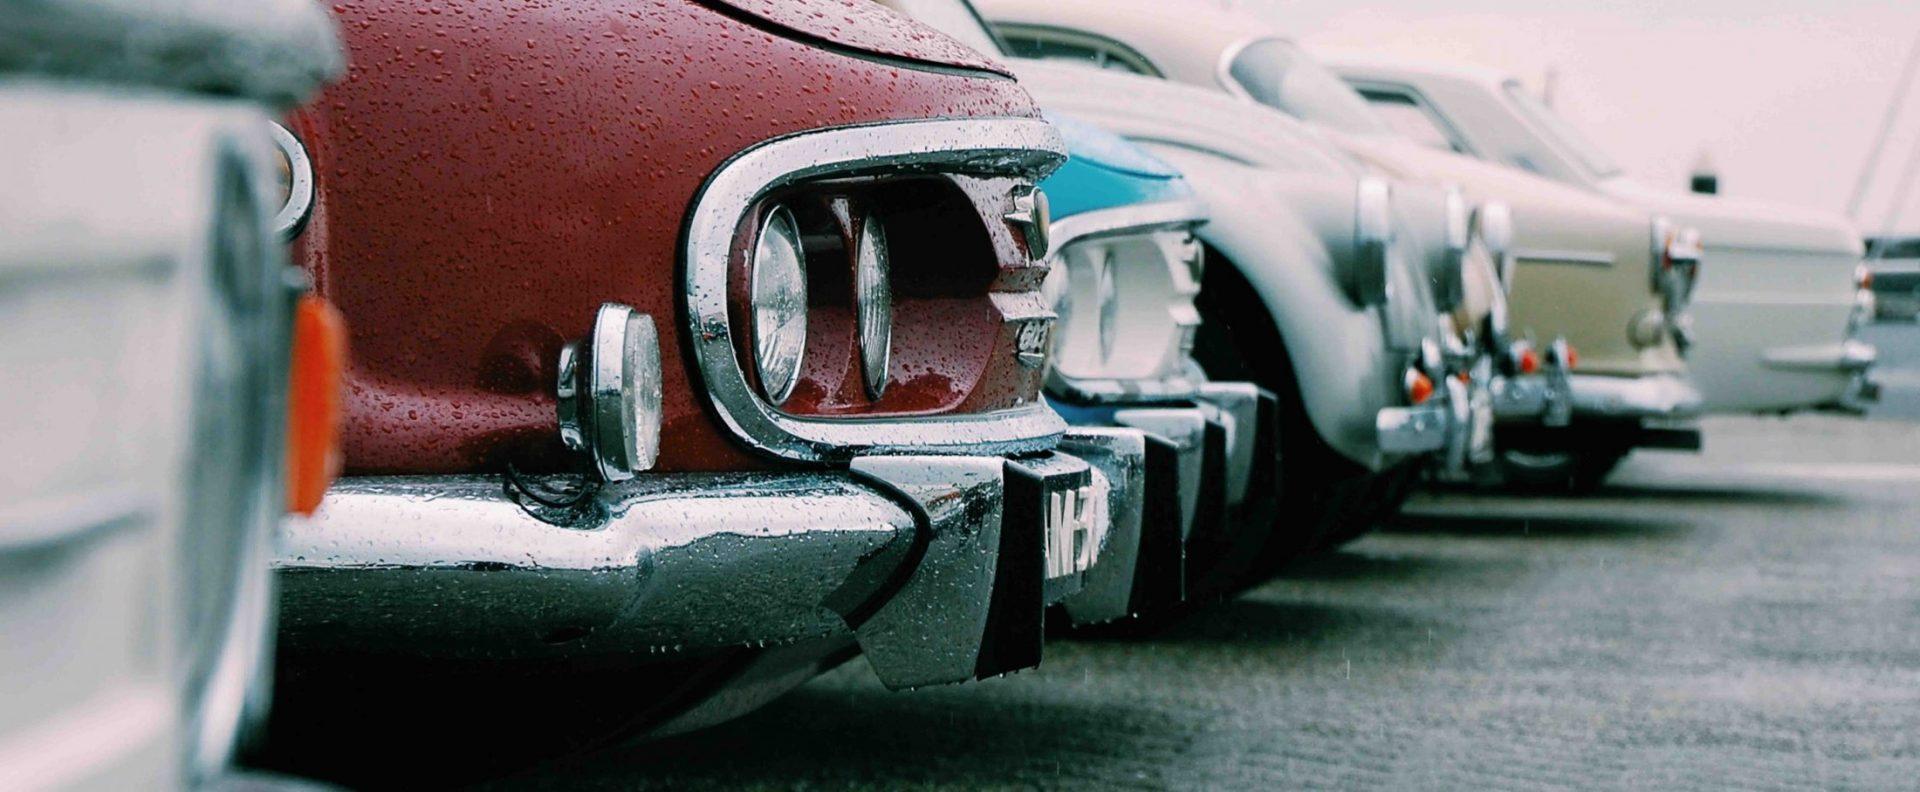 Car Parking | The Old Waverley Hotel in Edinburgh